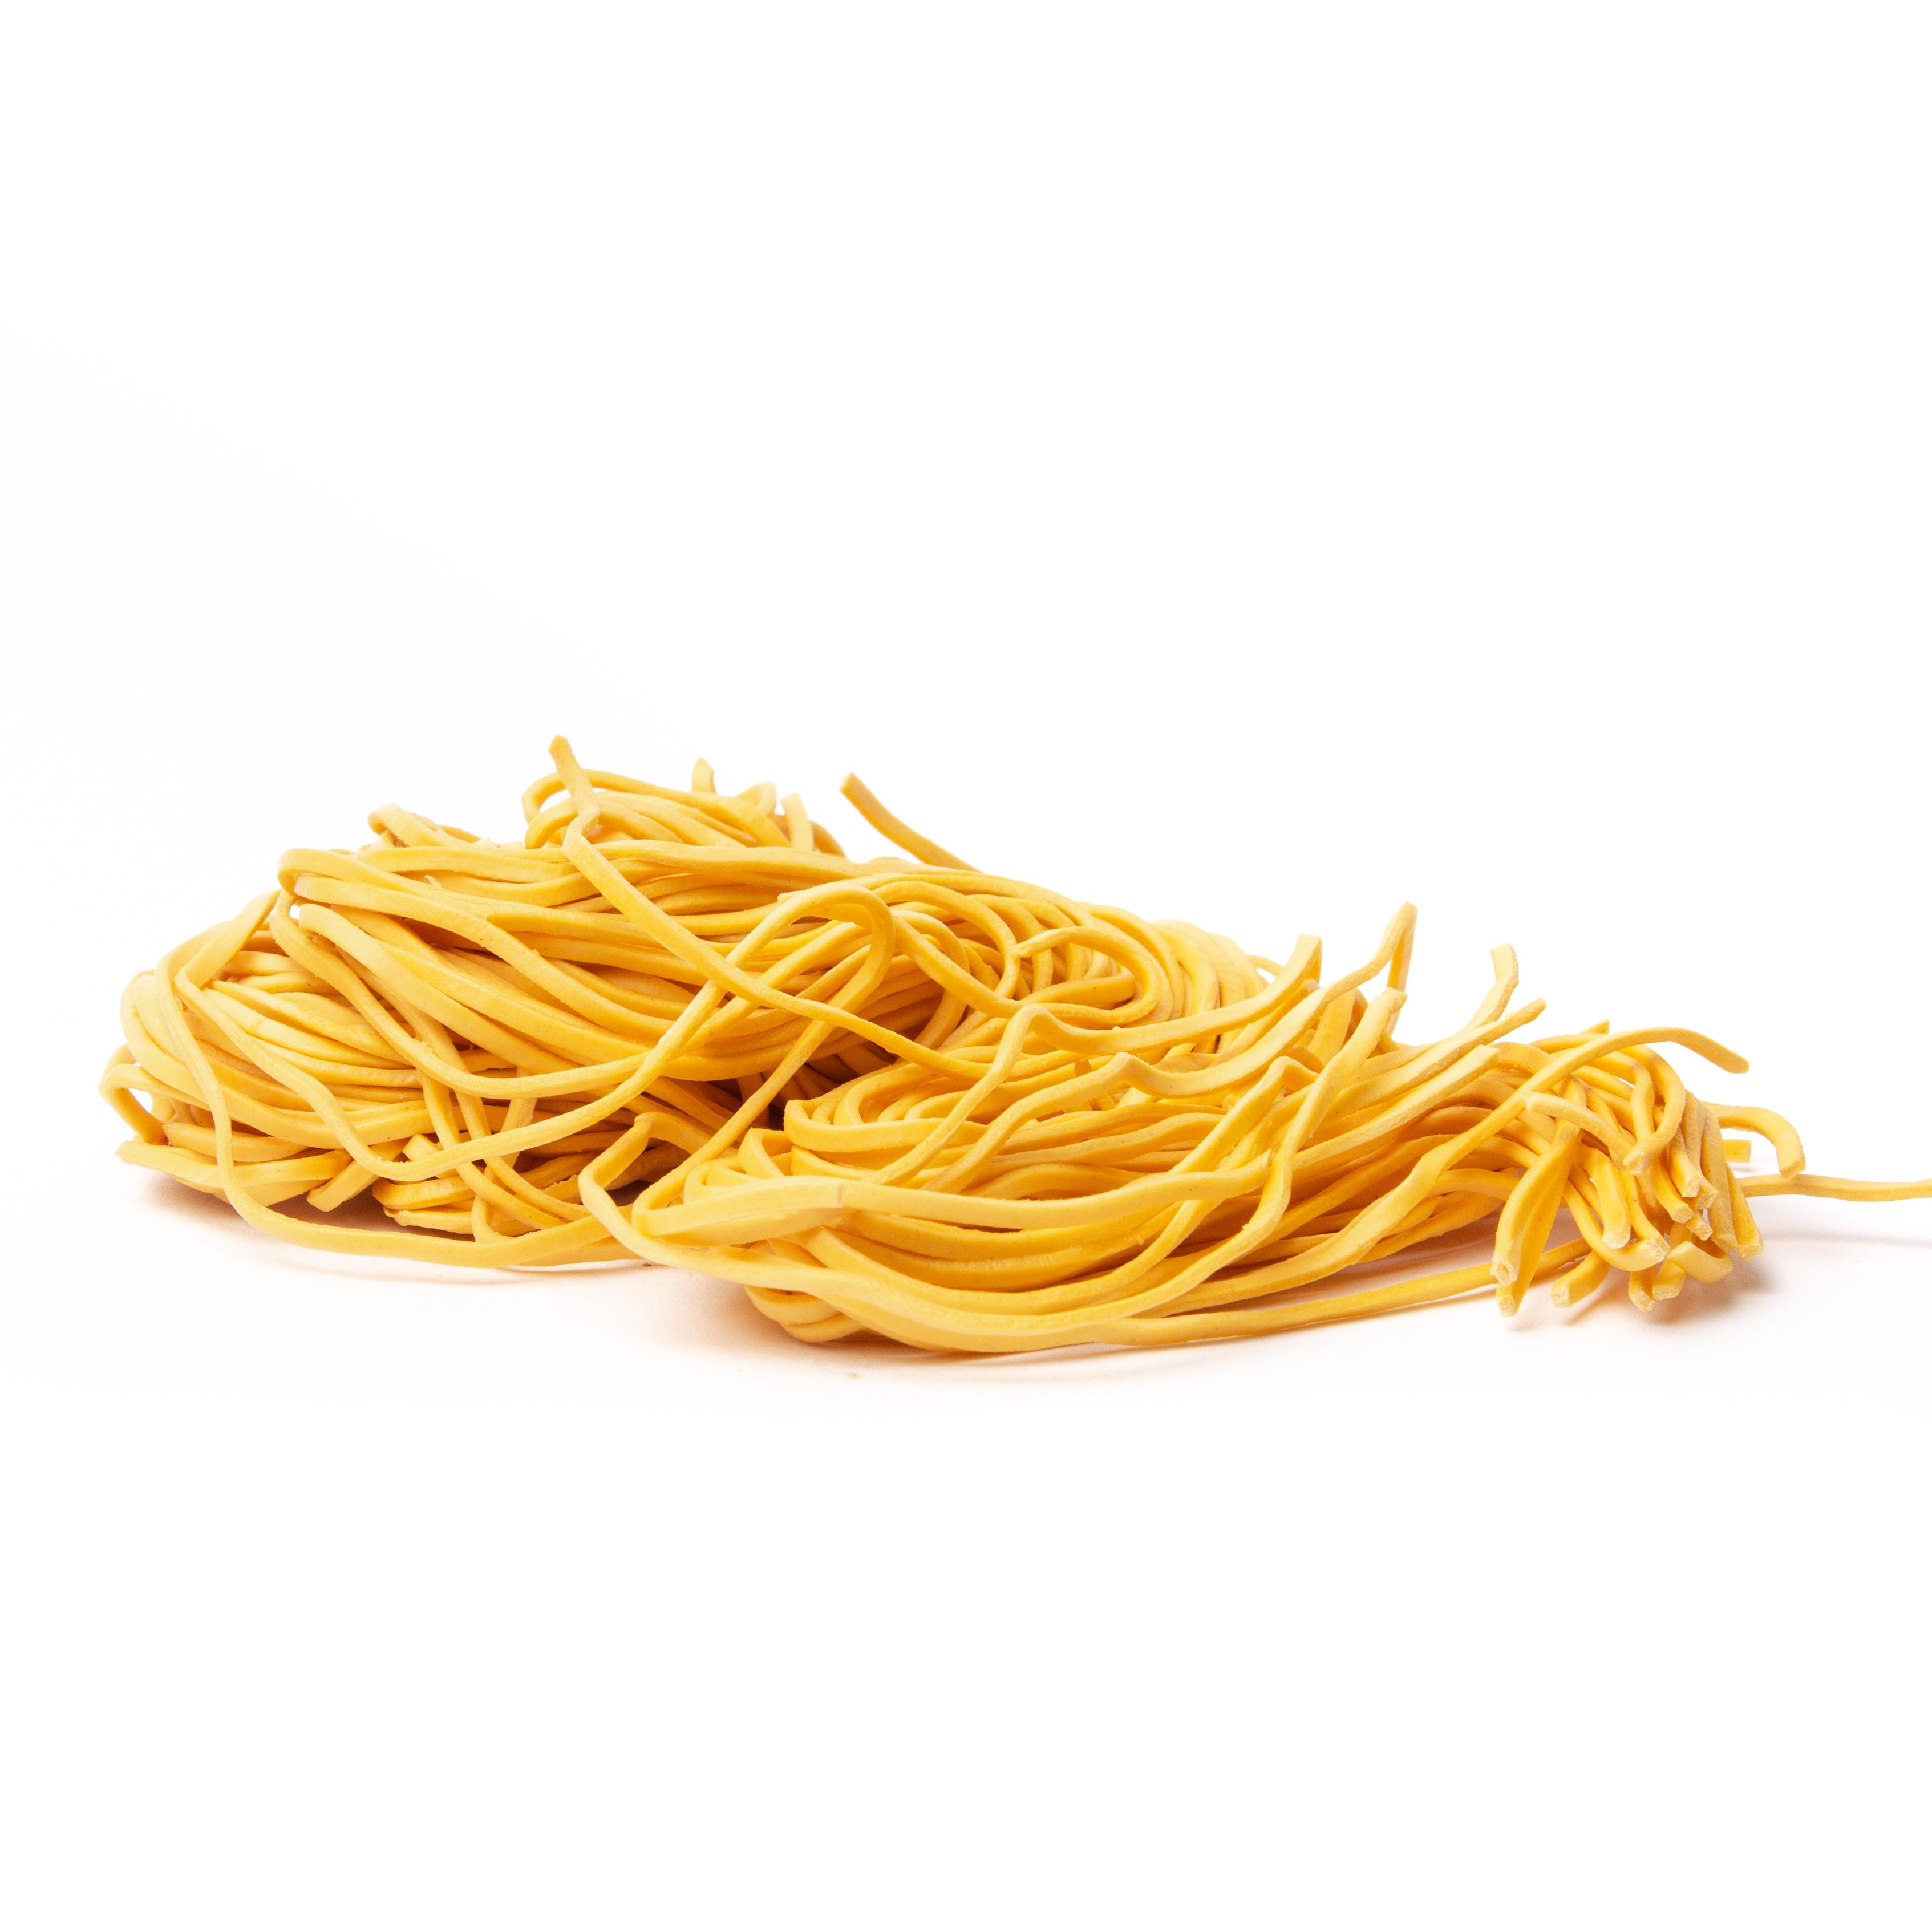 Thick Wheat Noodles | Vegan